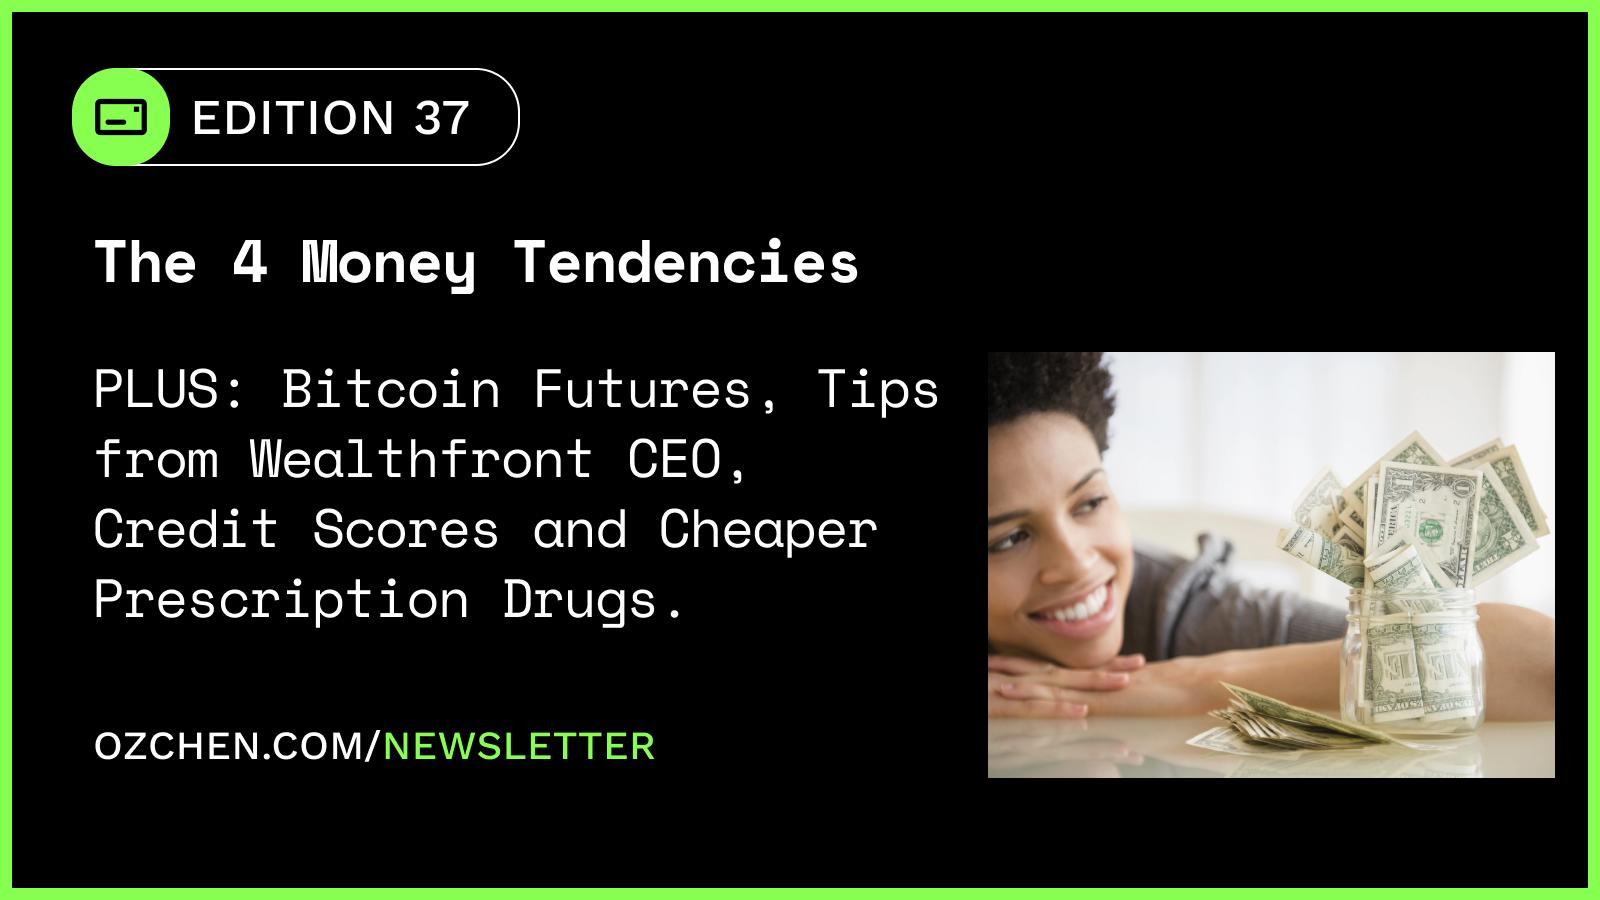 Edition 37 personal finance newsletter money beliefs